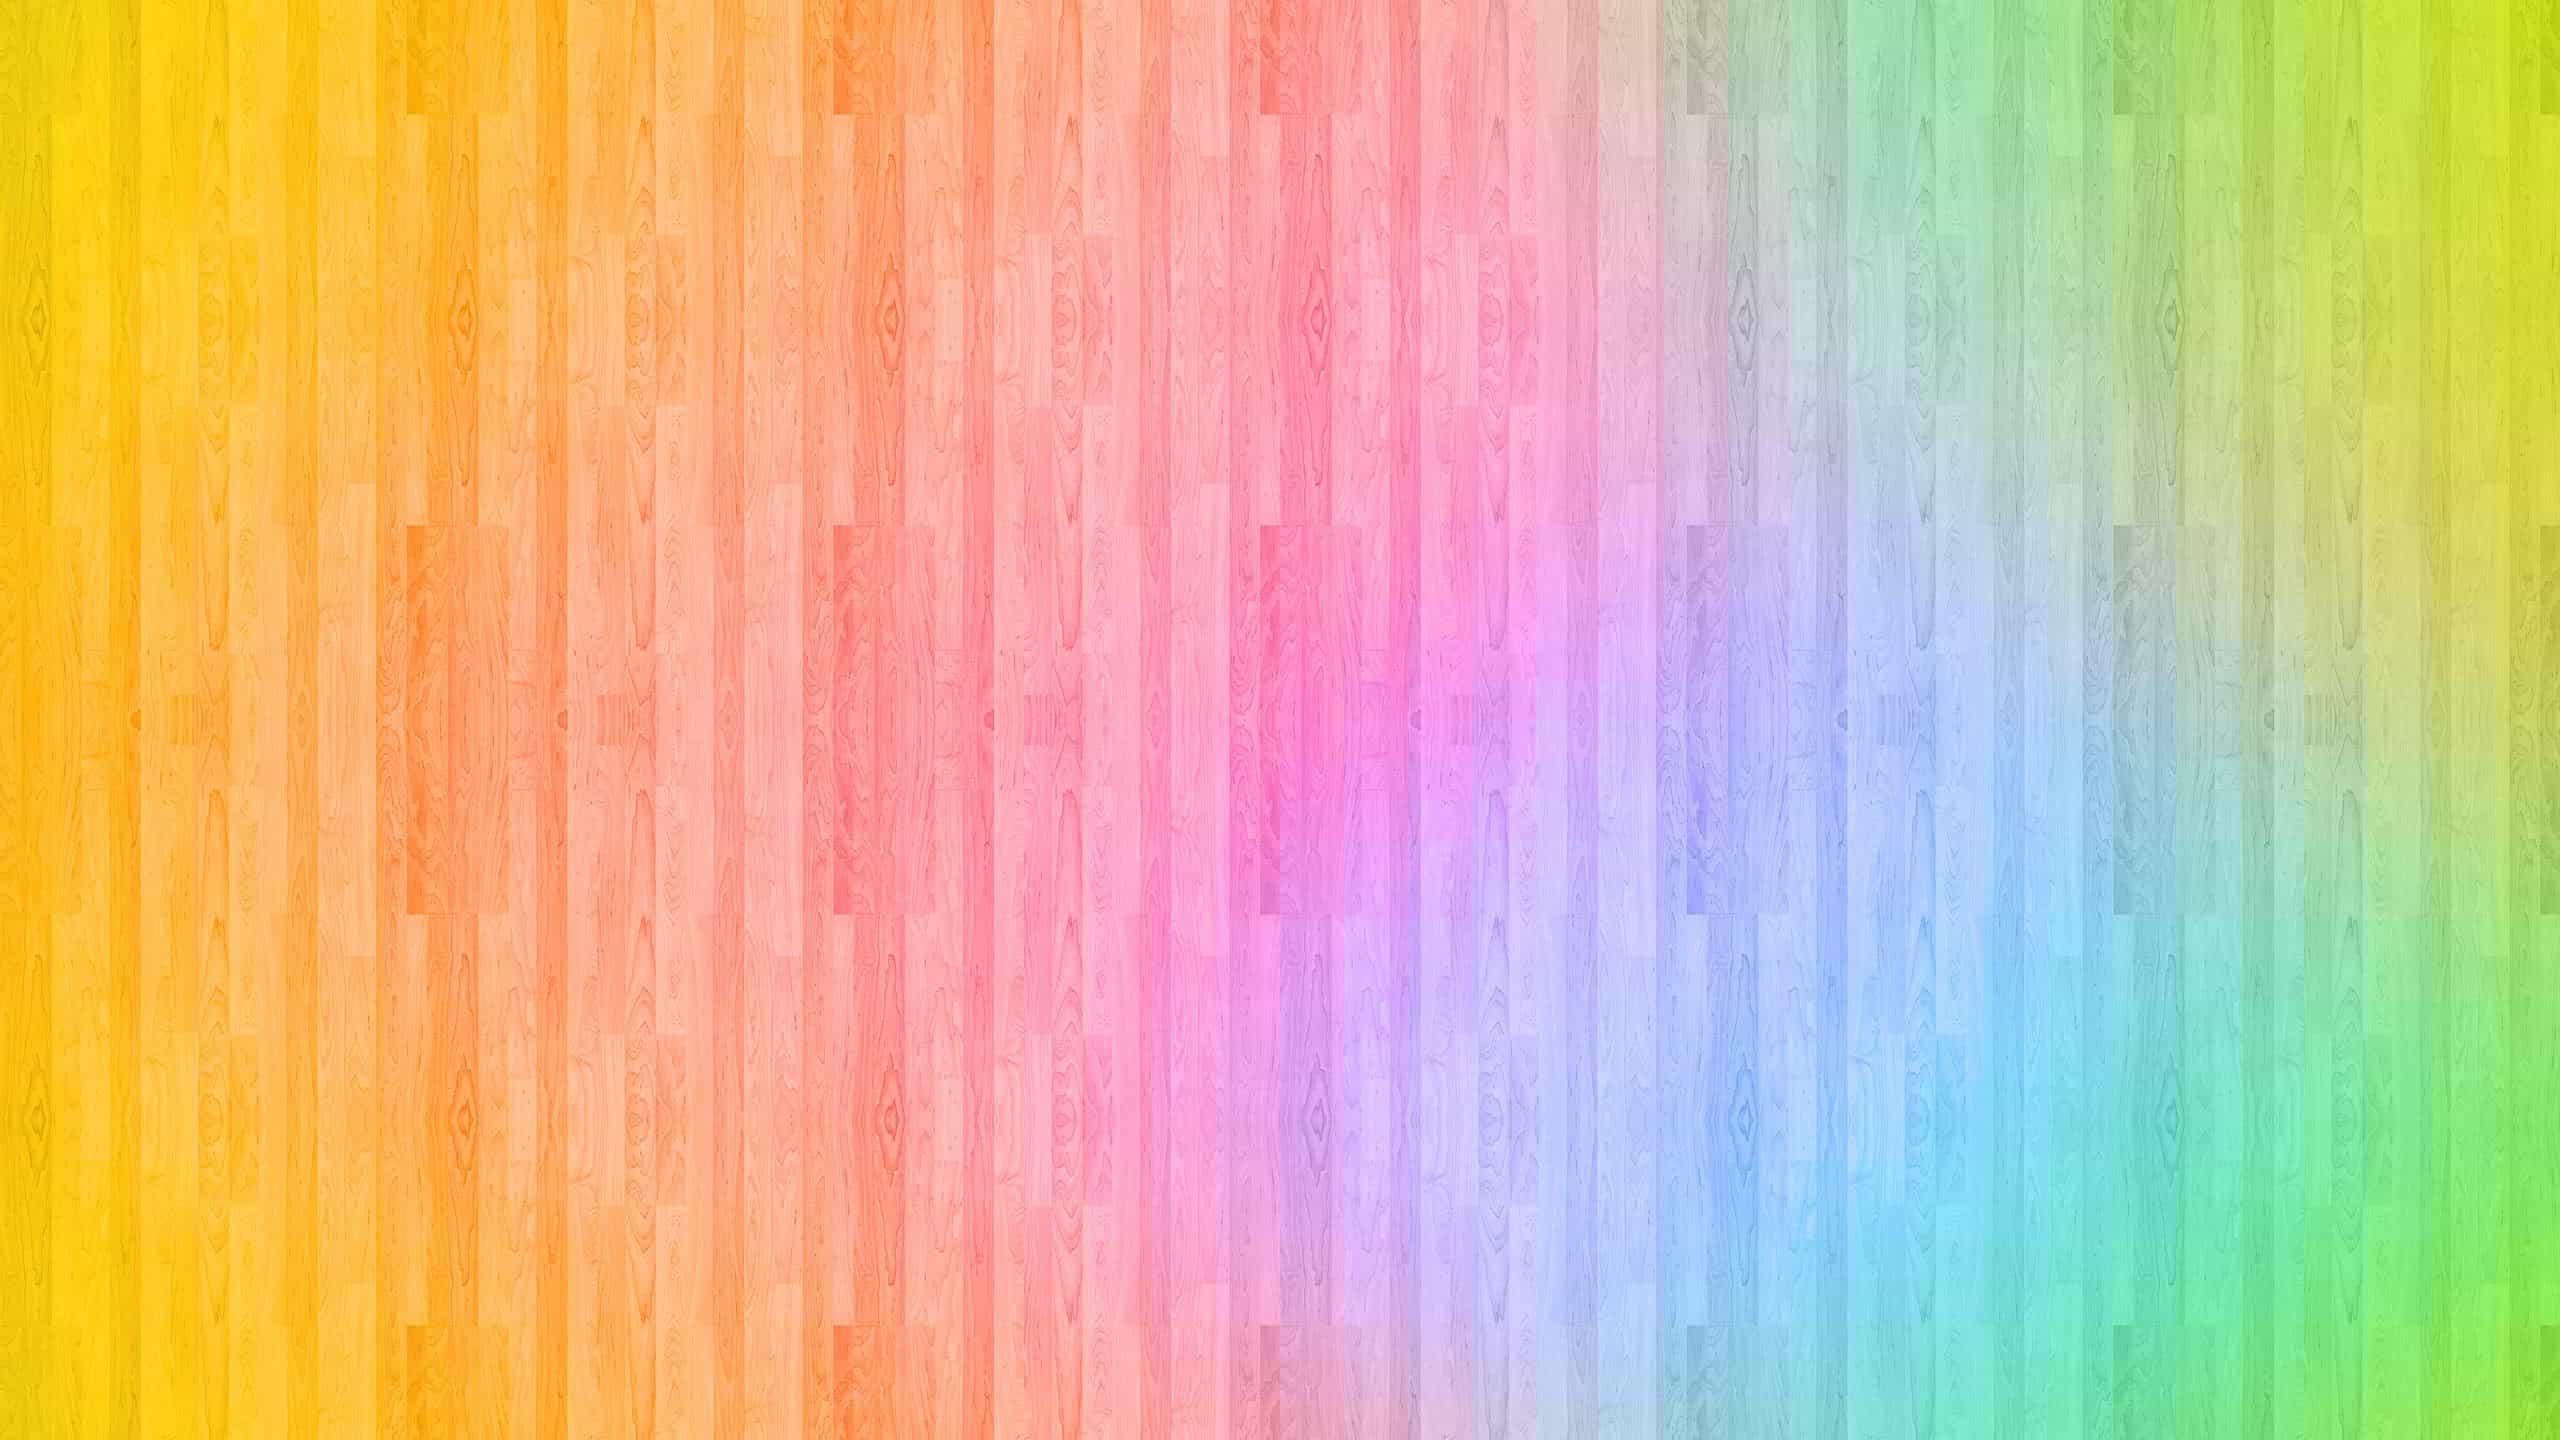 rainbow wood wqhd 1440p wallpaper